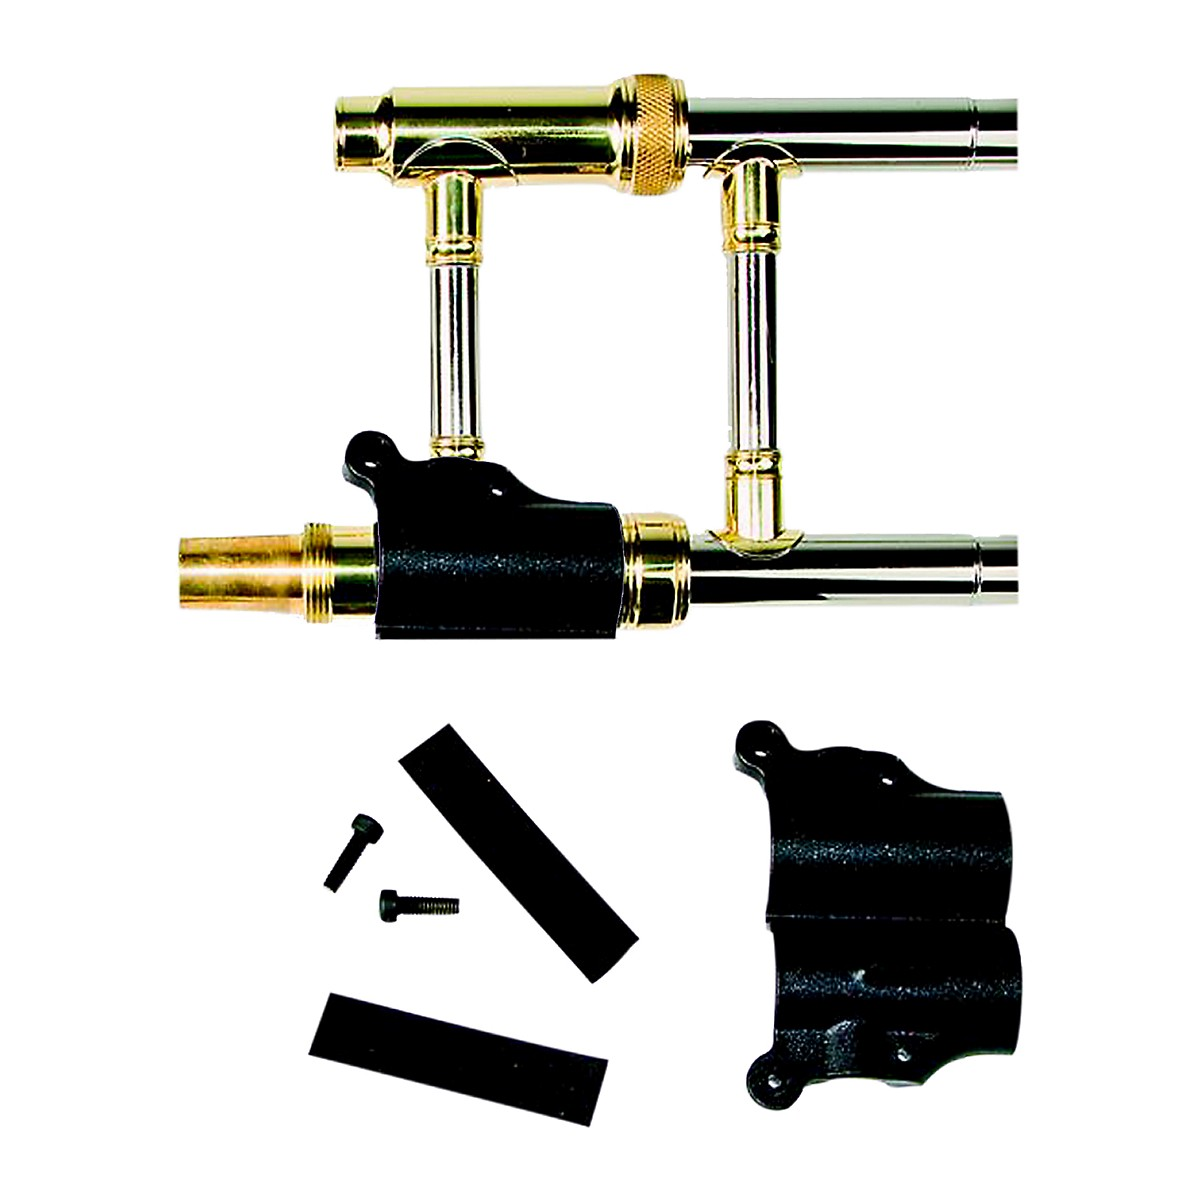 Neotech Trombone Grip Straight Gusseted Trombone Bushing Kit